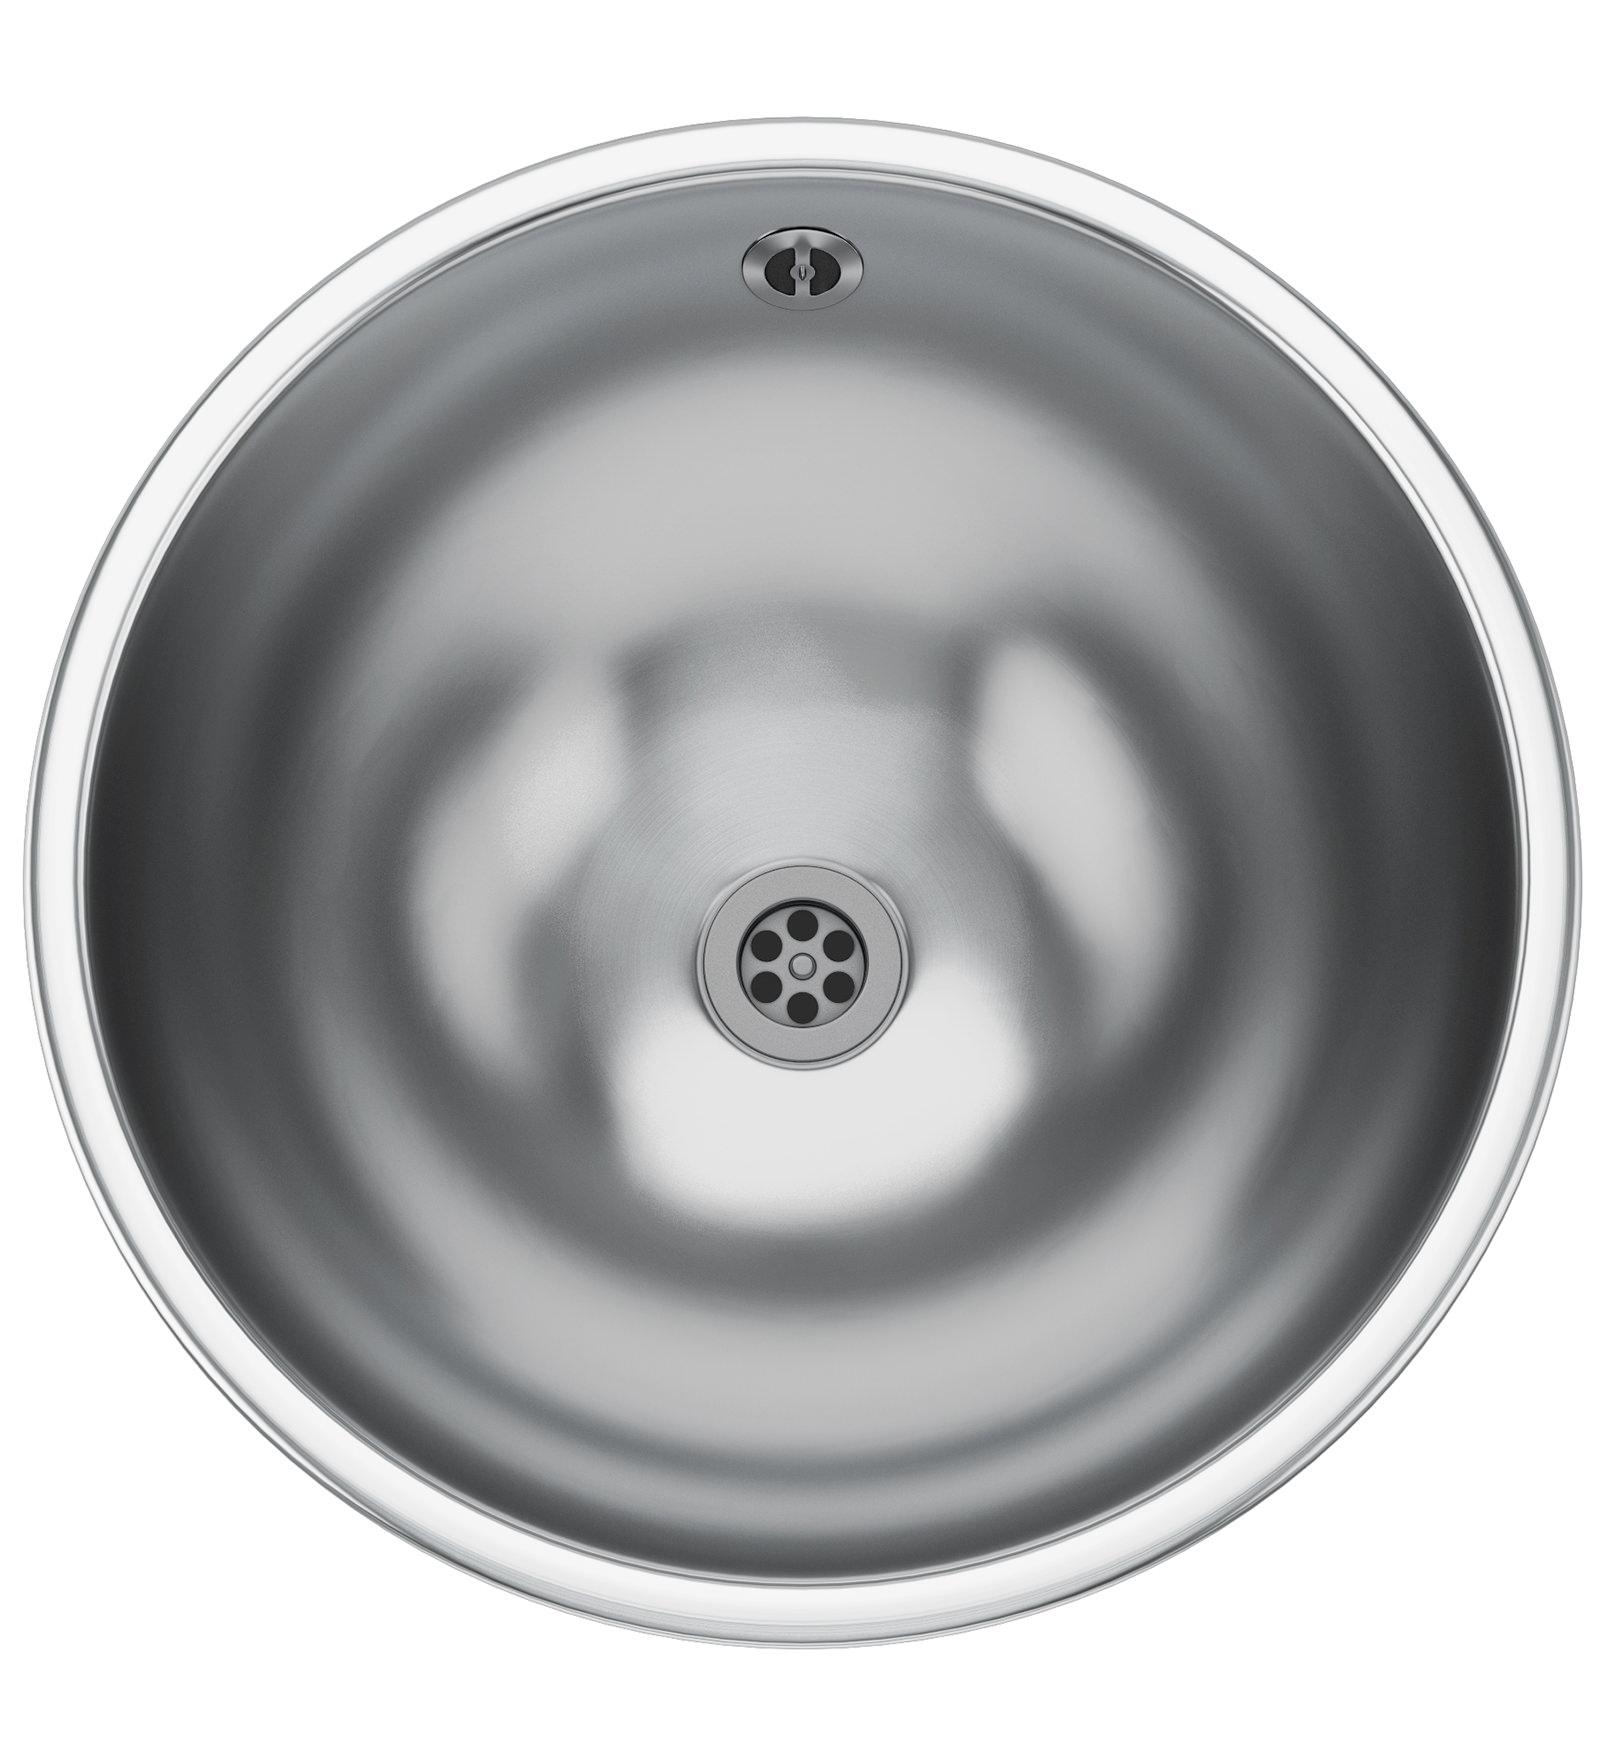 Franke Rondo RNX 610 10 Bowl Stainless Steel Kitchen